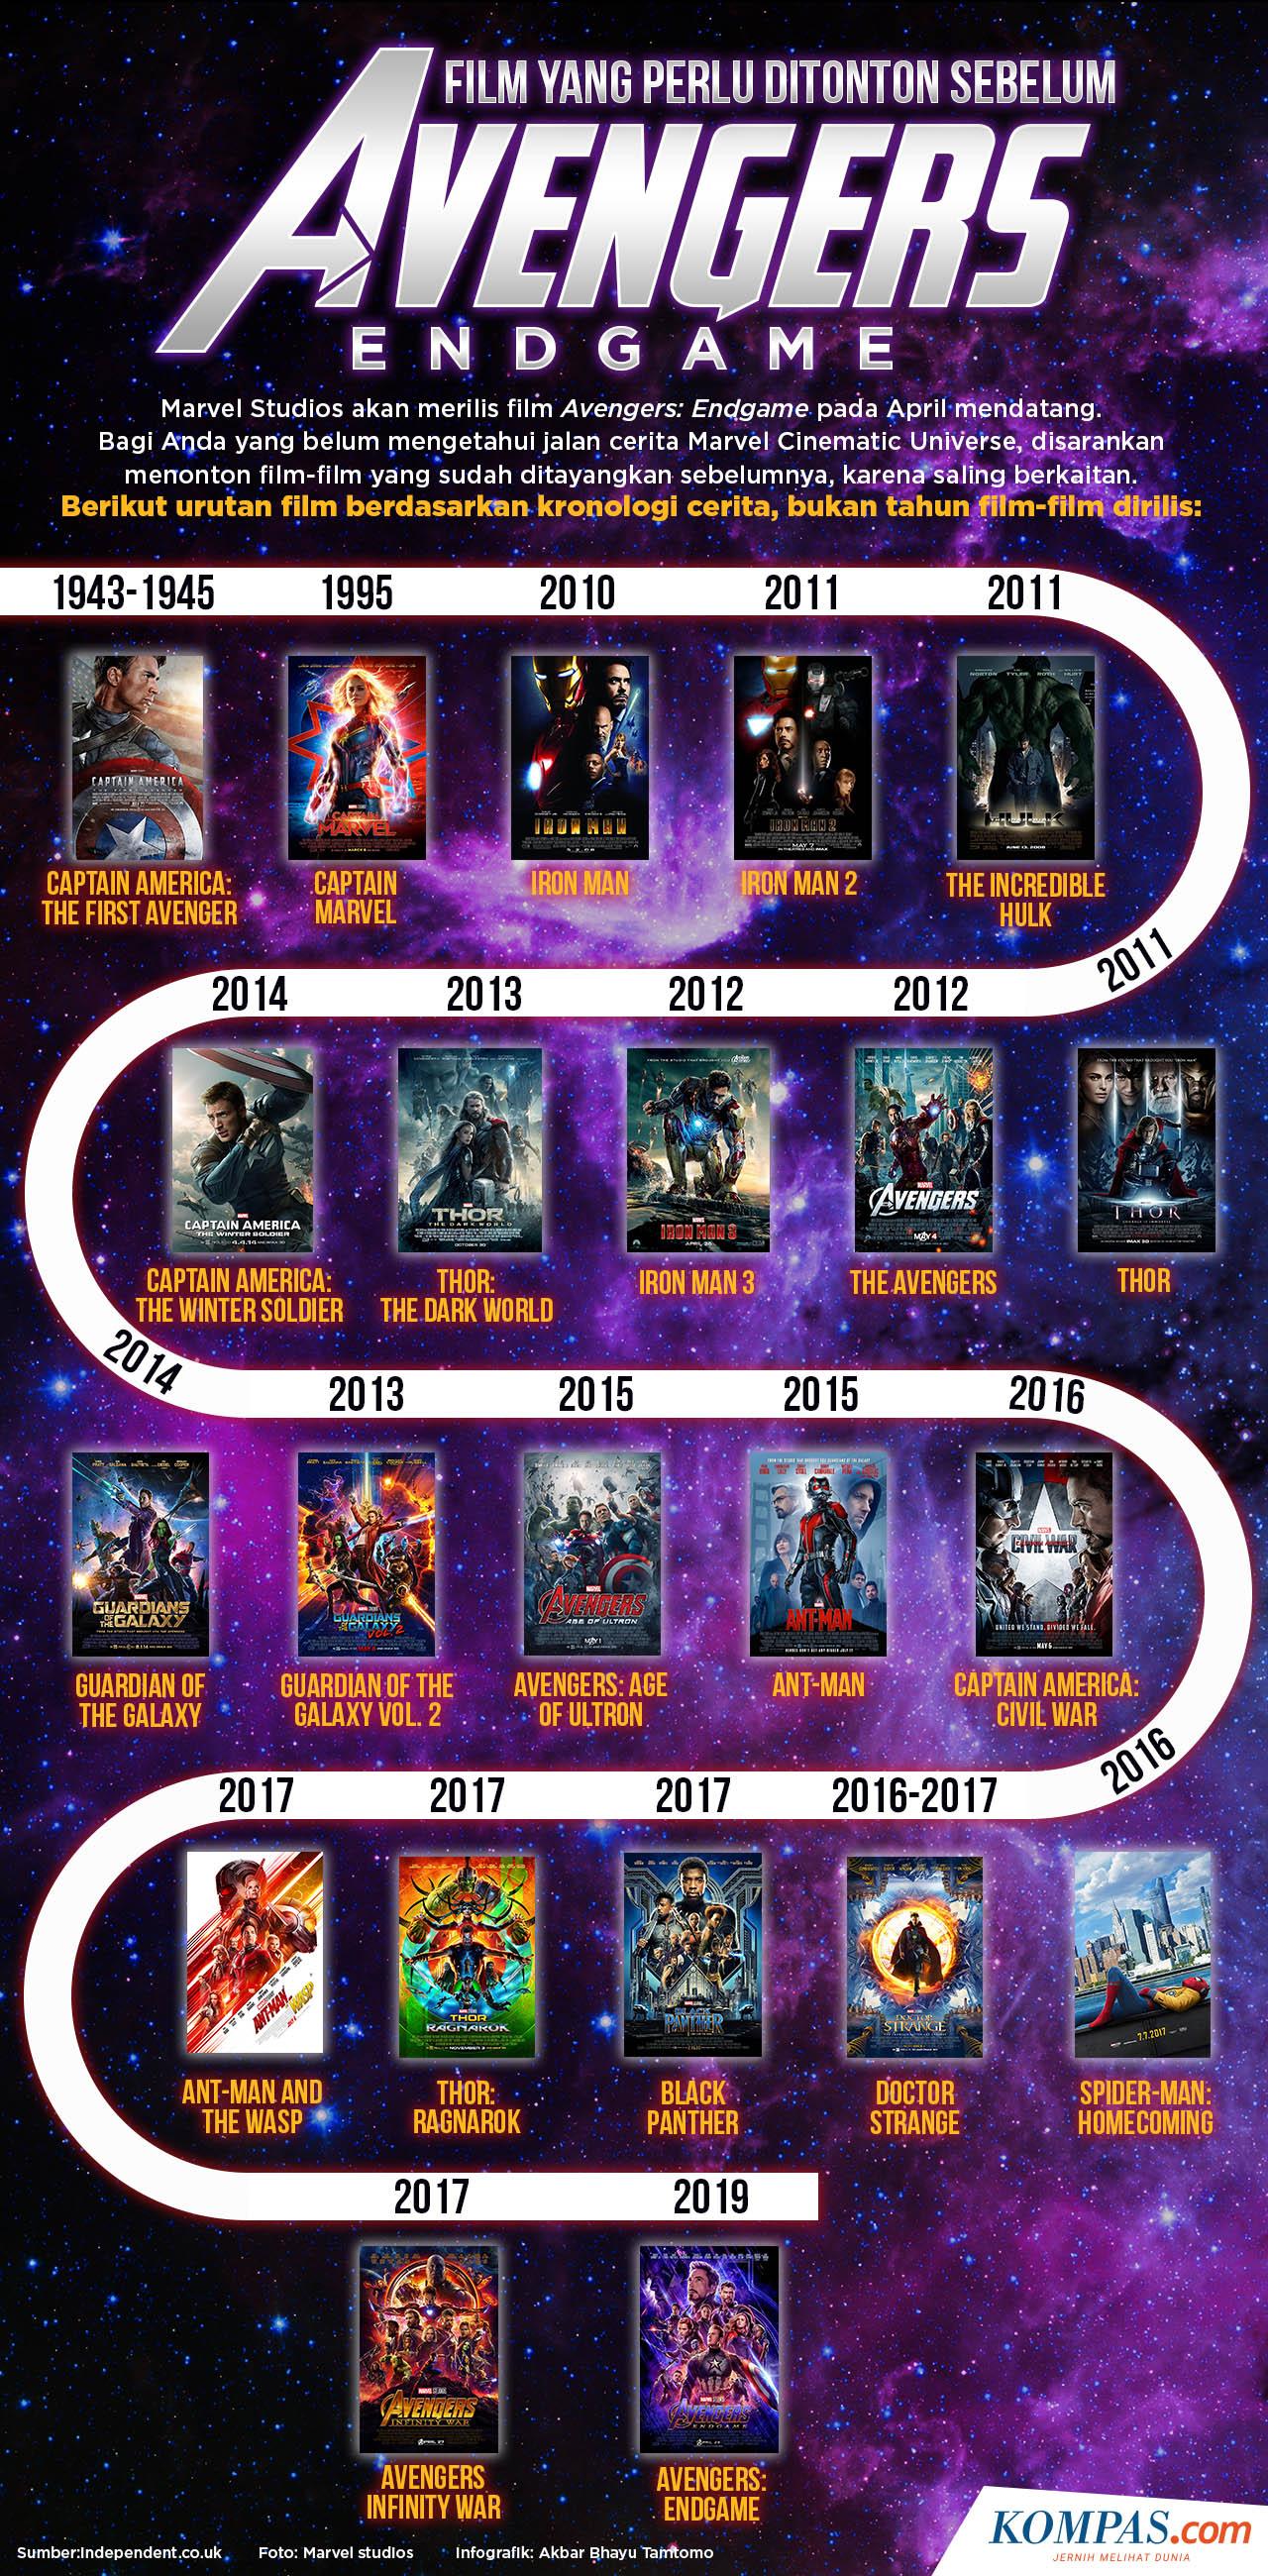 919d4daae Infografik: Film yang Perlu Ditonton Sebelum Avengers: Endgame  (KOMPAS.com/Akbar Bhayu Tamtomo)